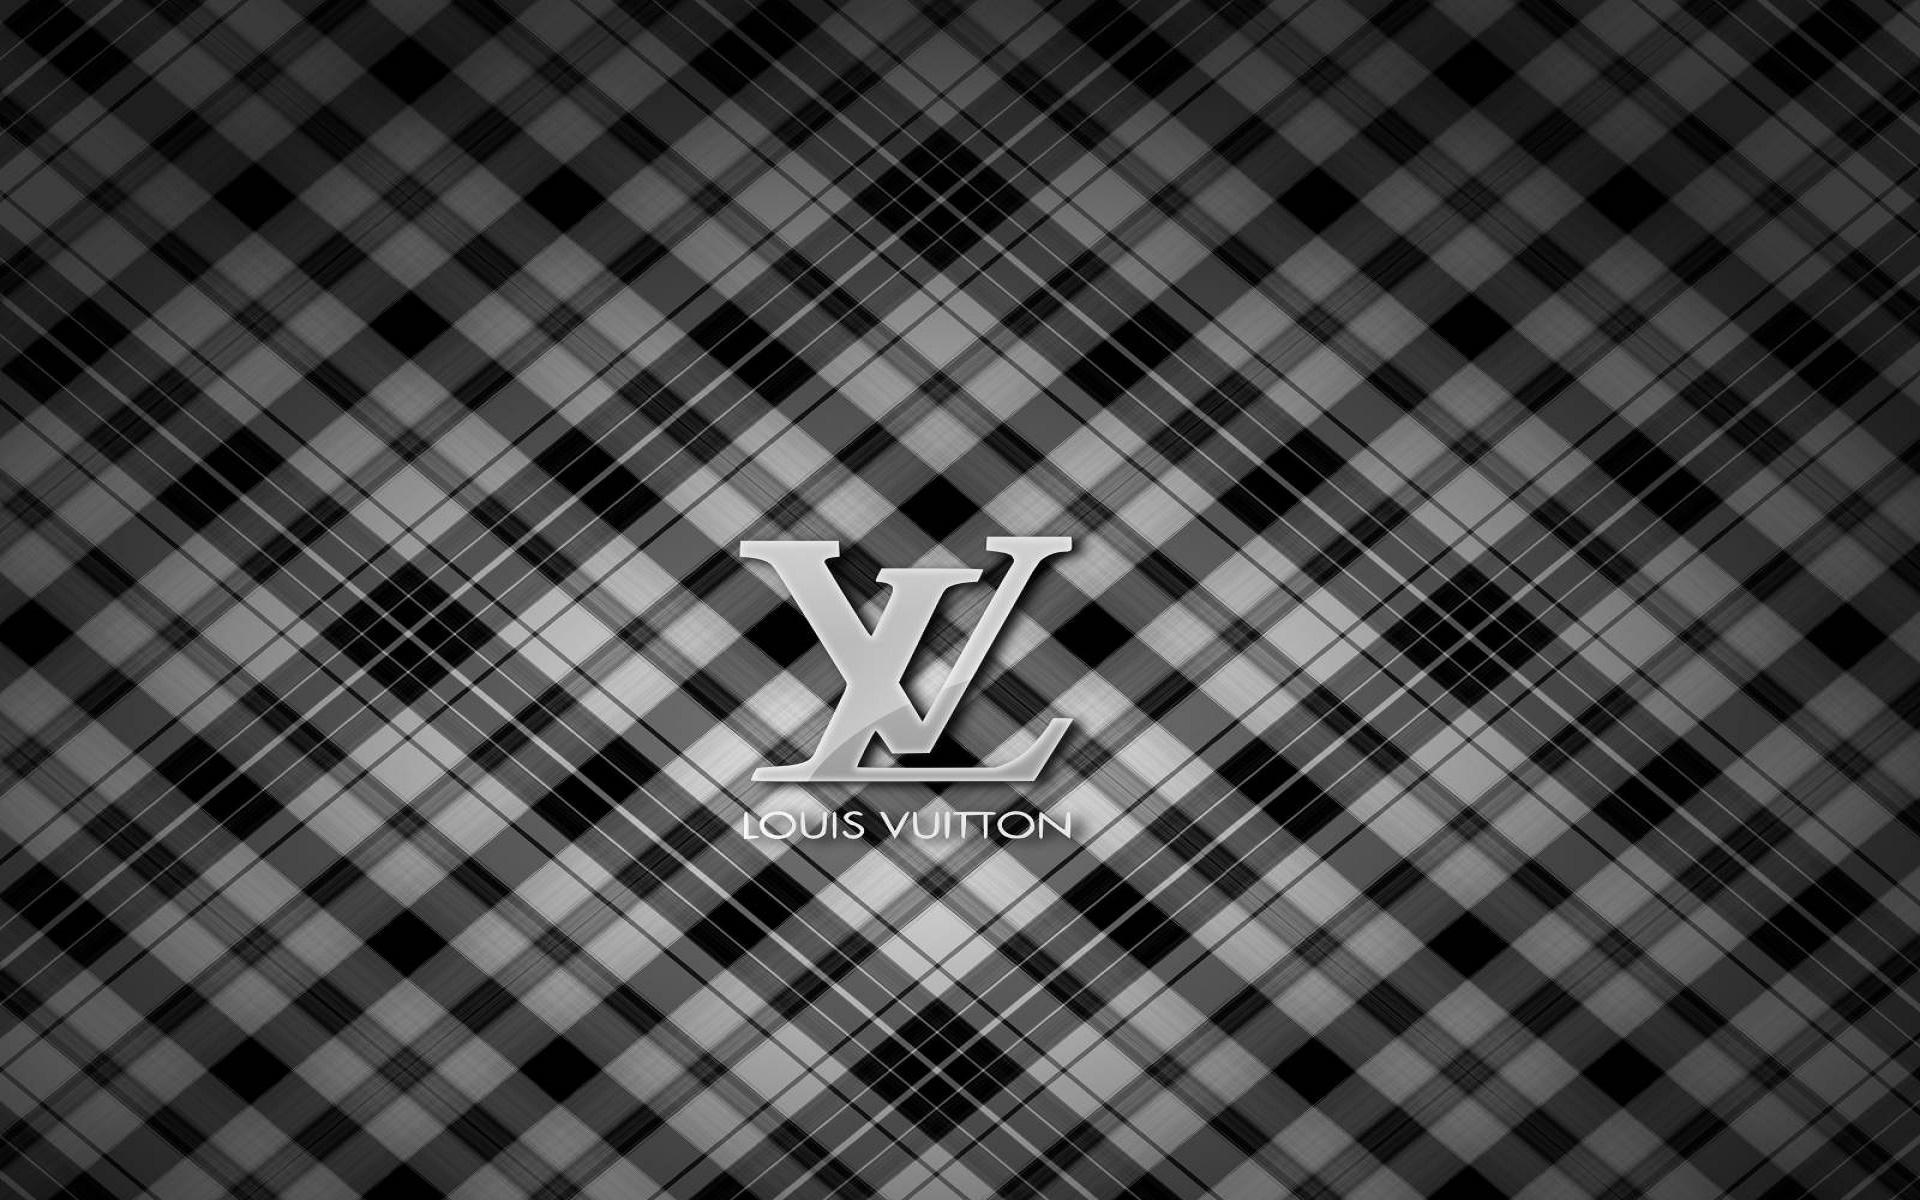 Wallpaper 1080p Hd Gucci